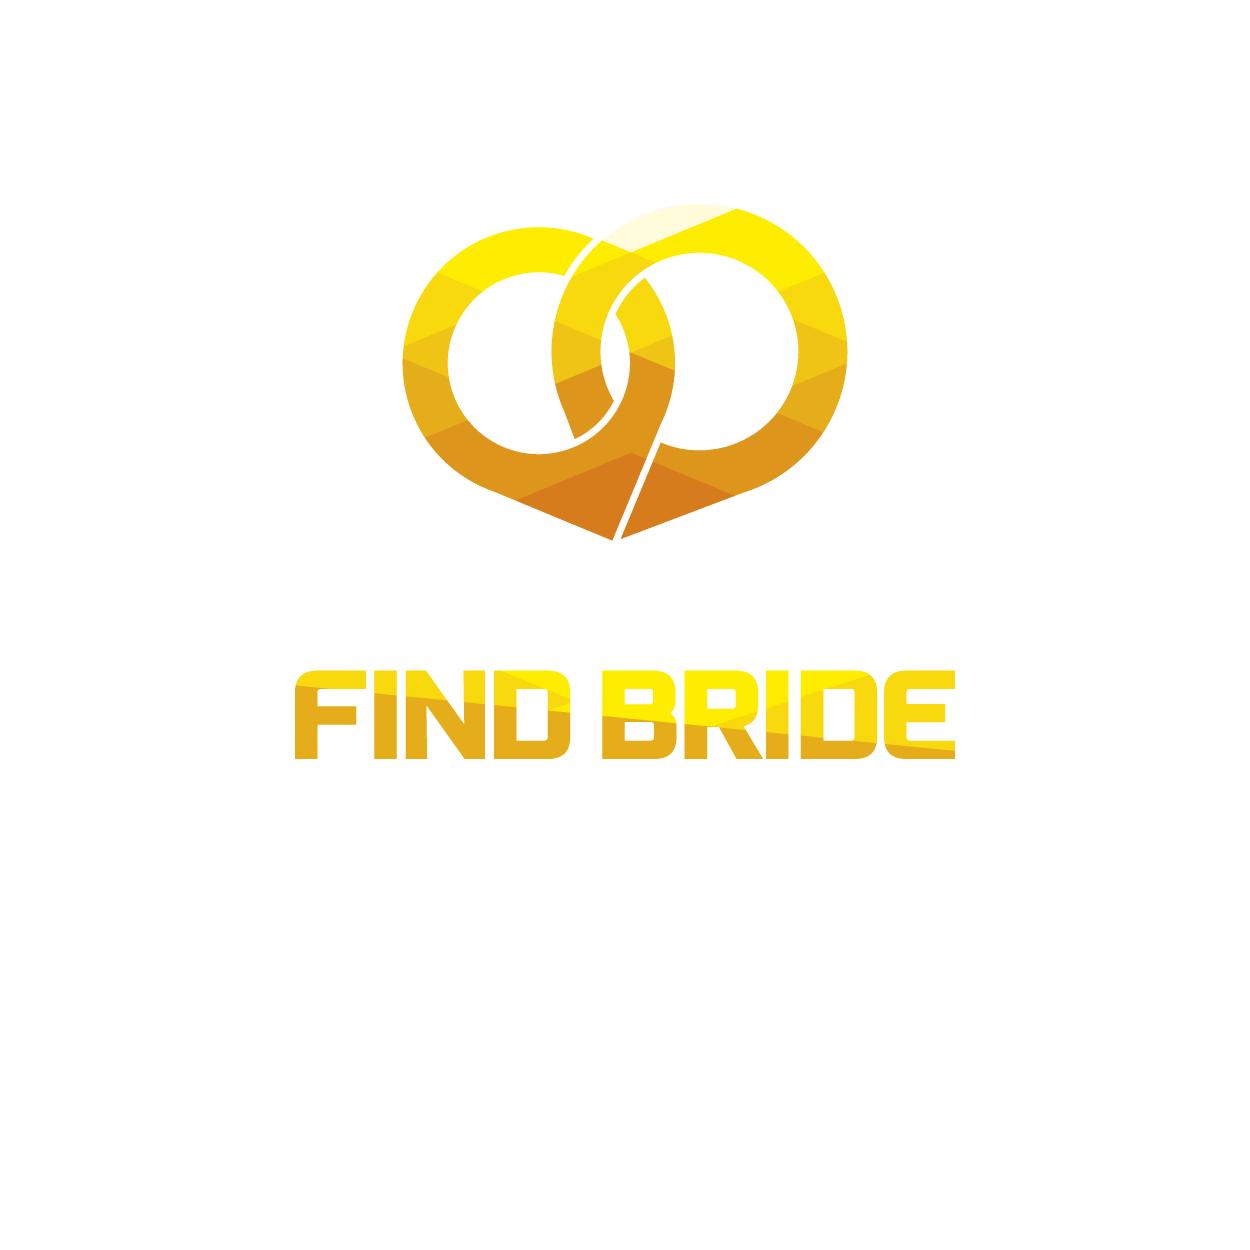 Нарисовать логотип сайта знакомств фото f_9585acde7e057e66.png